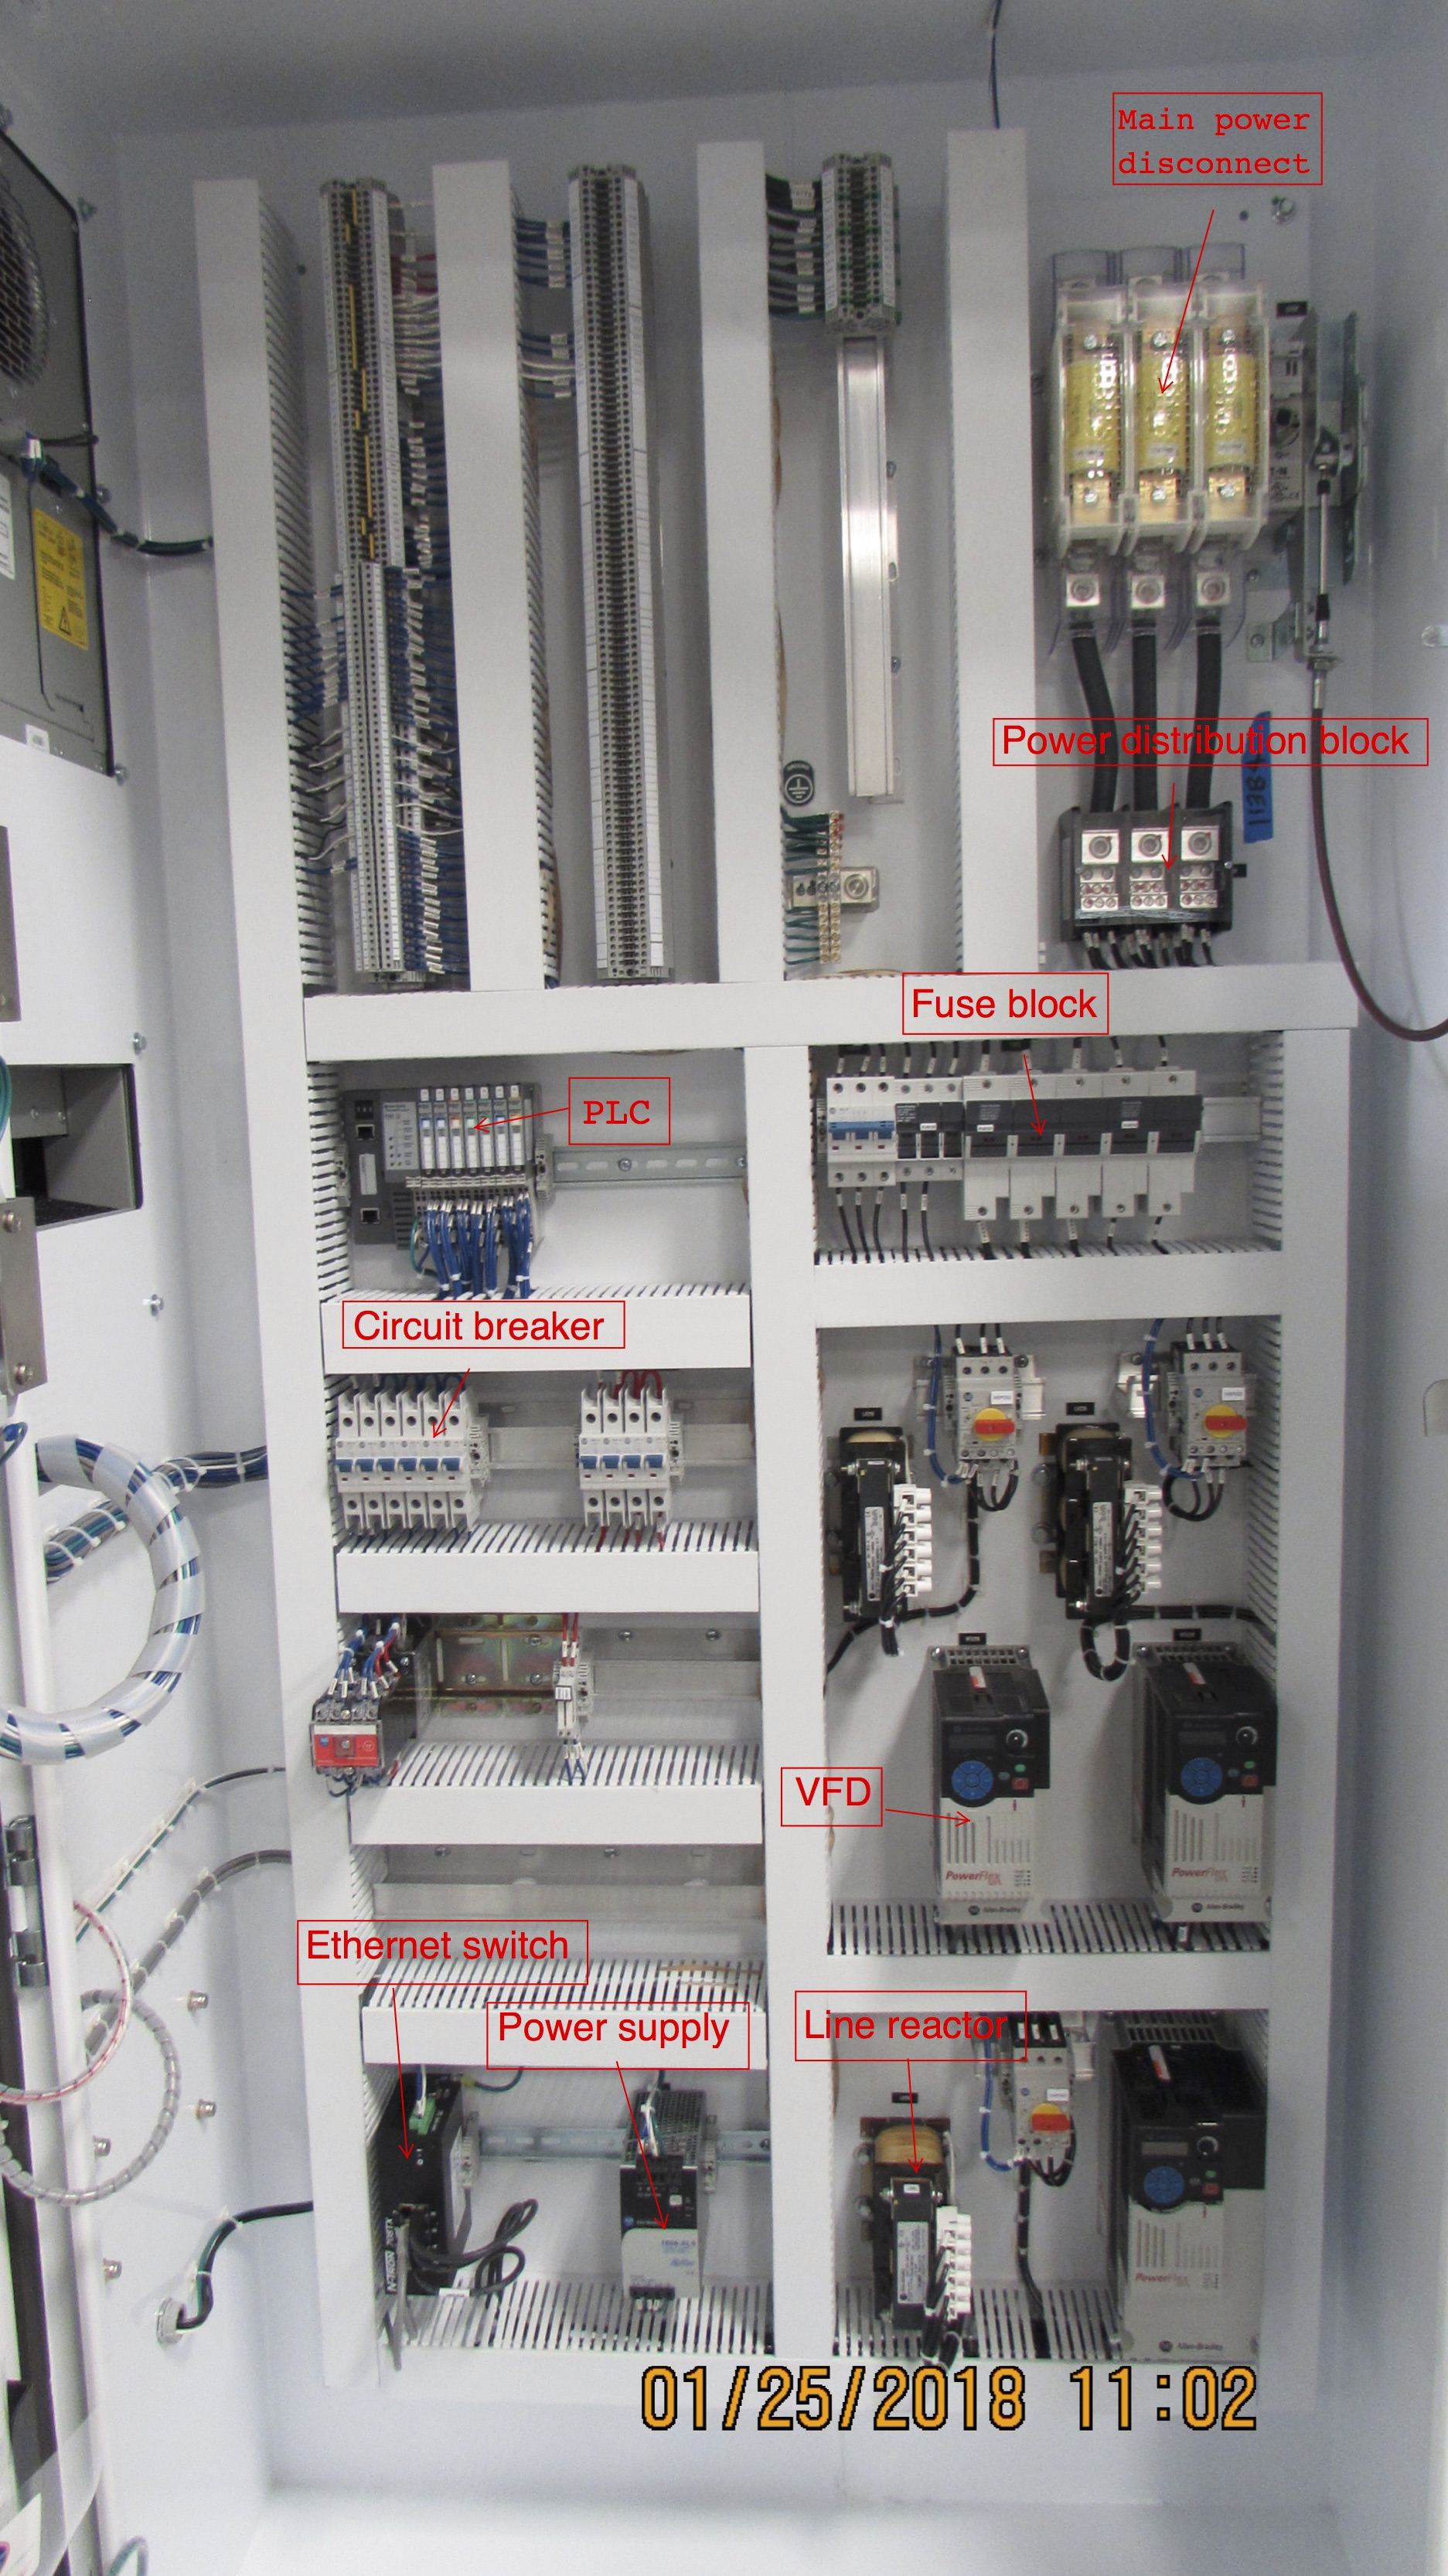 Wiring Diagram Control Board Wiring Diagram Crius V2 Wiring Diagram